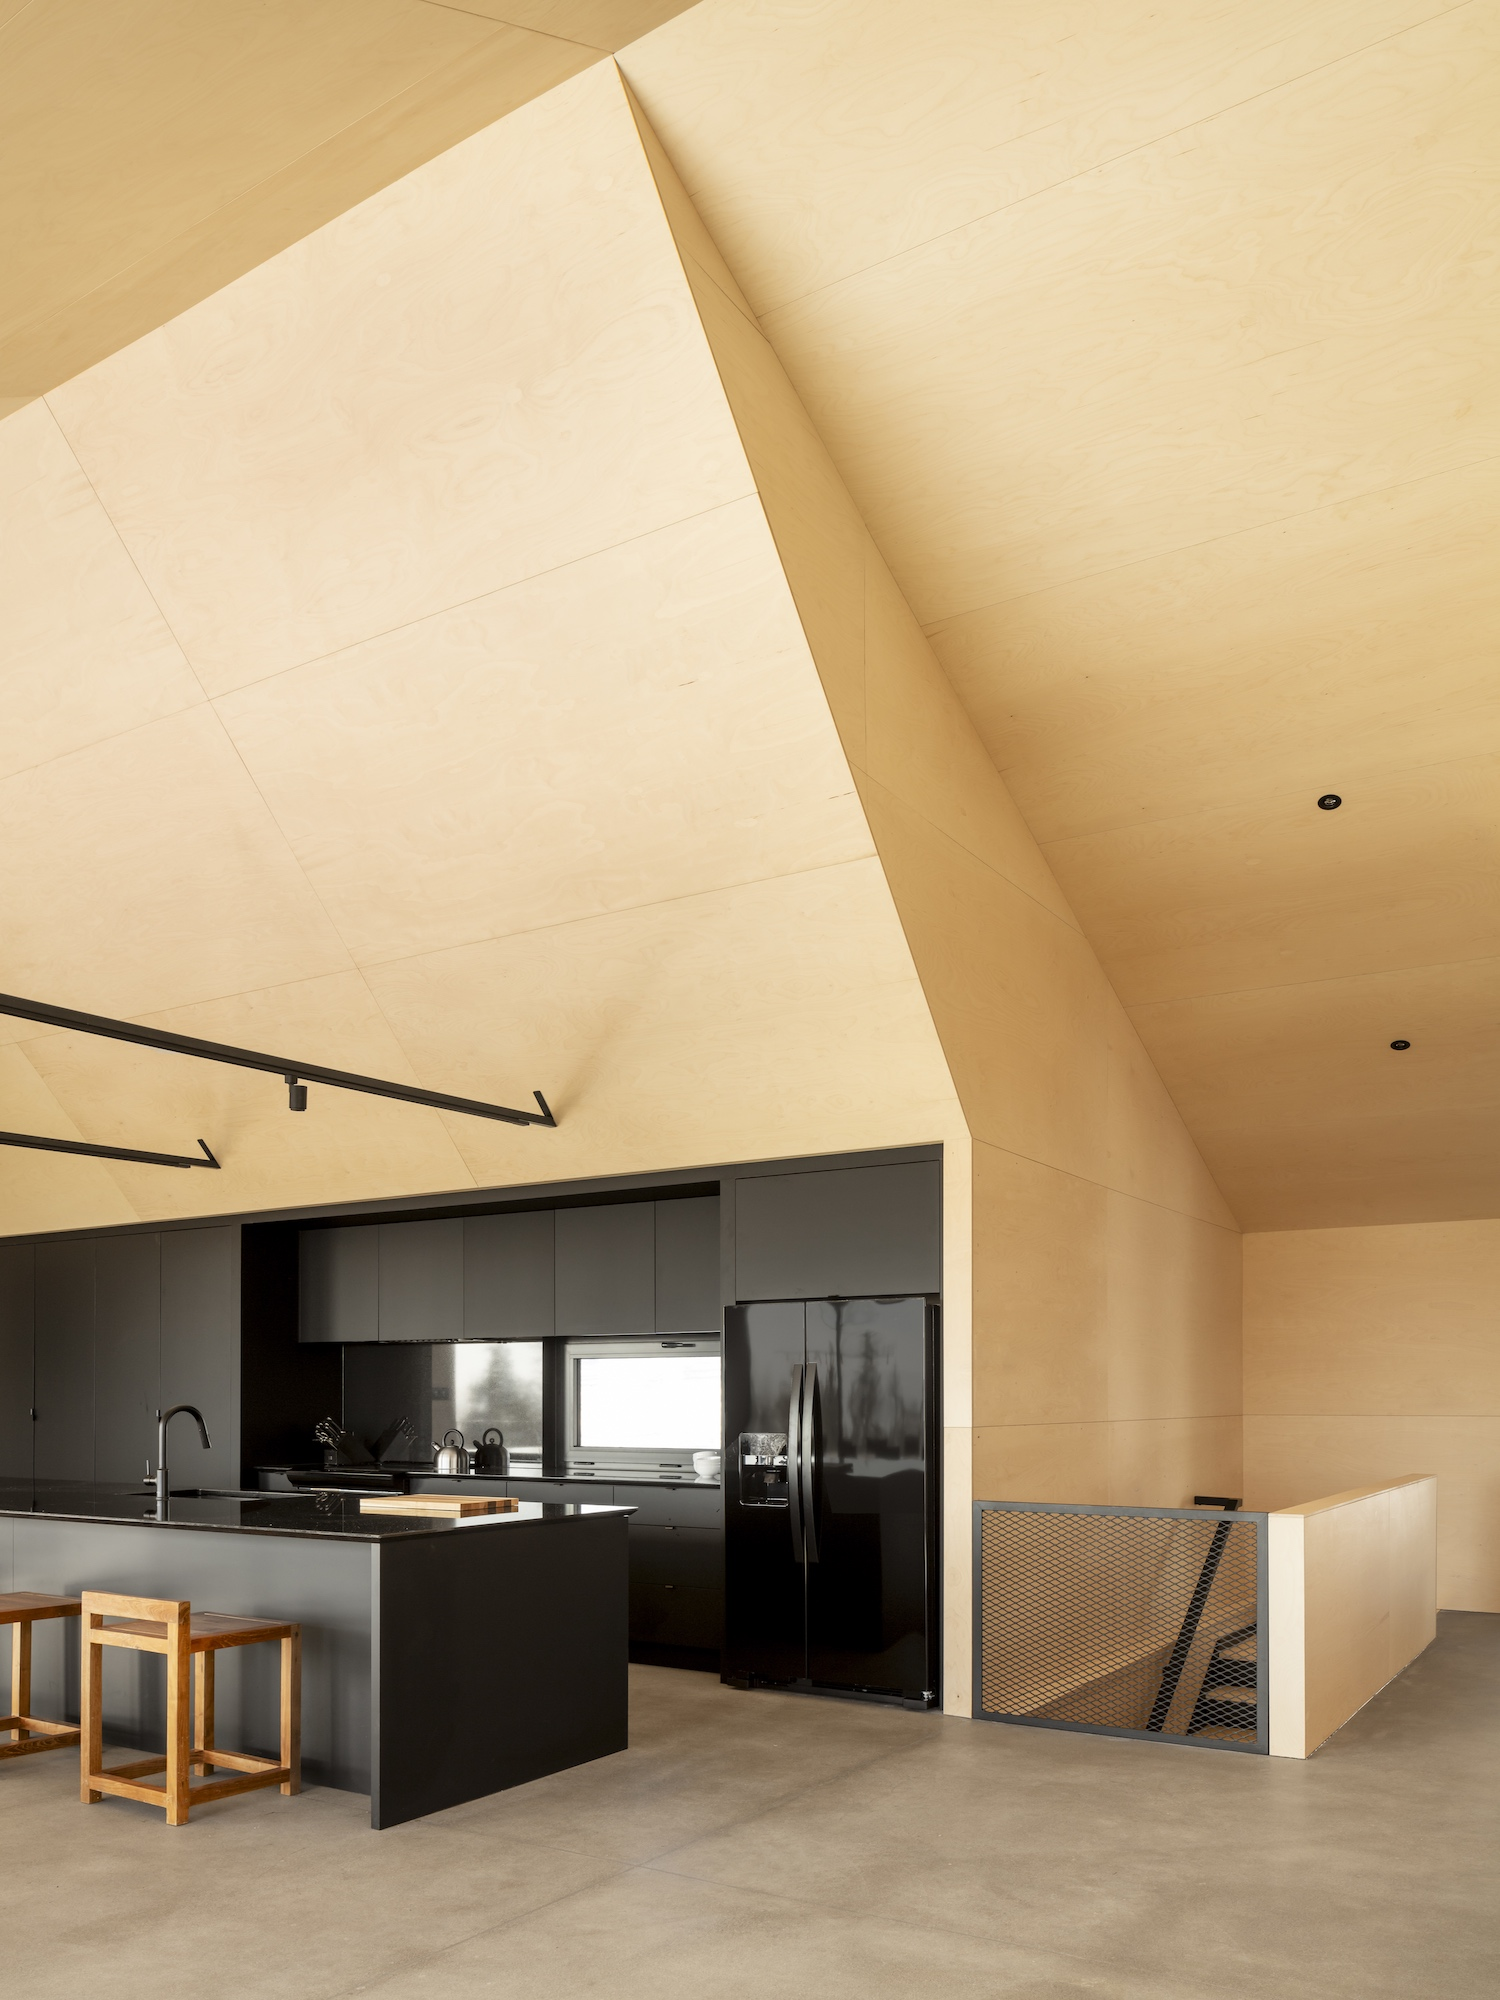 est living bourgeois lechasseur architects cabin a 07